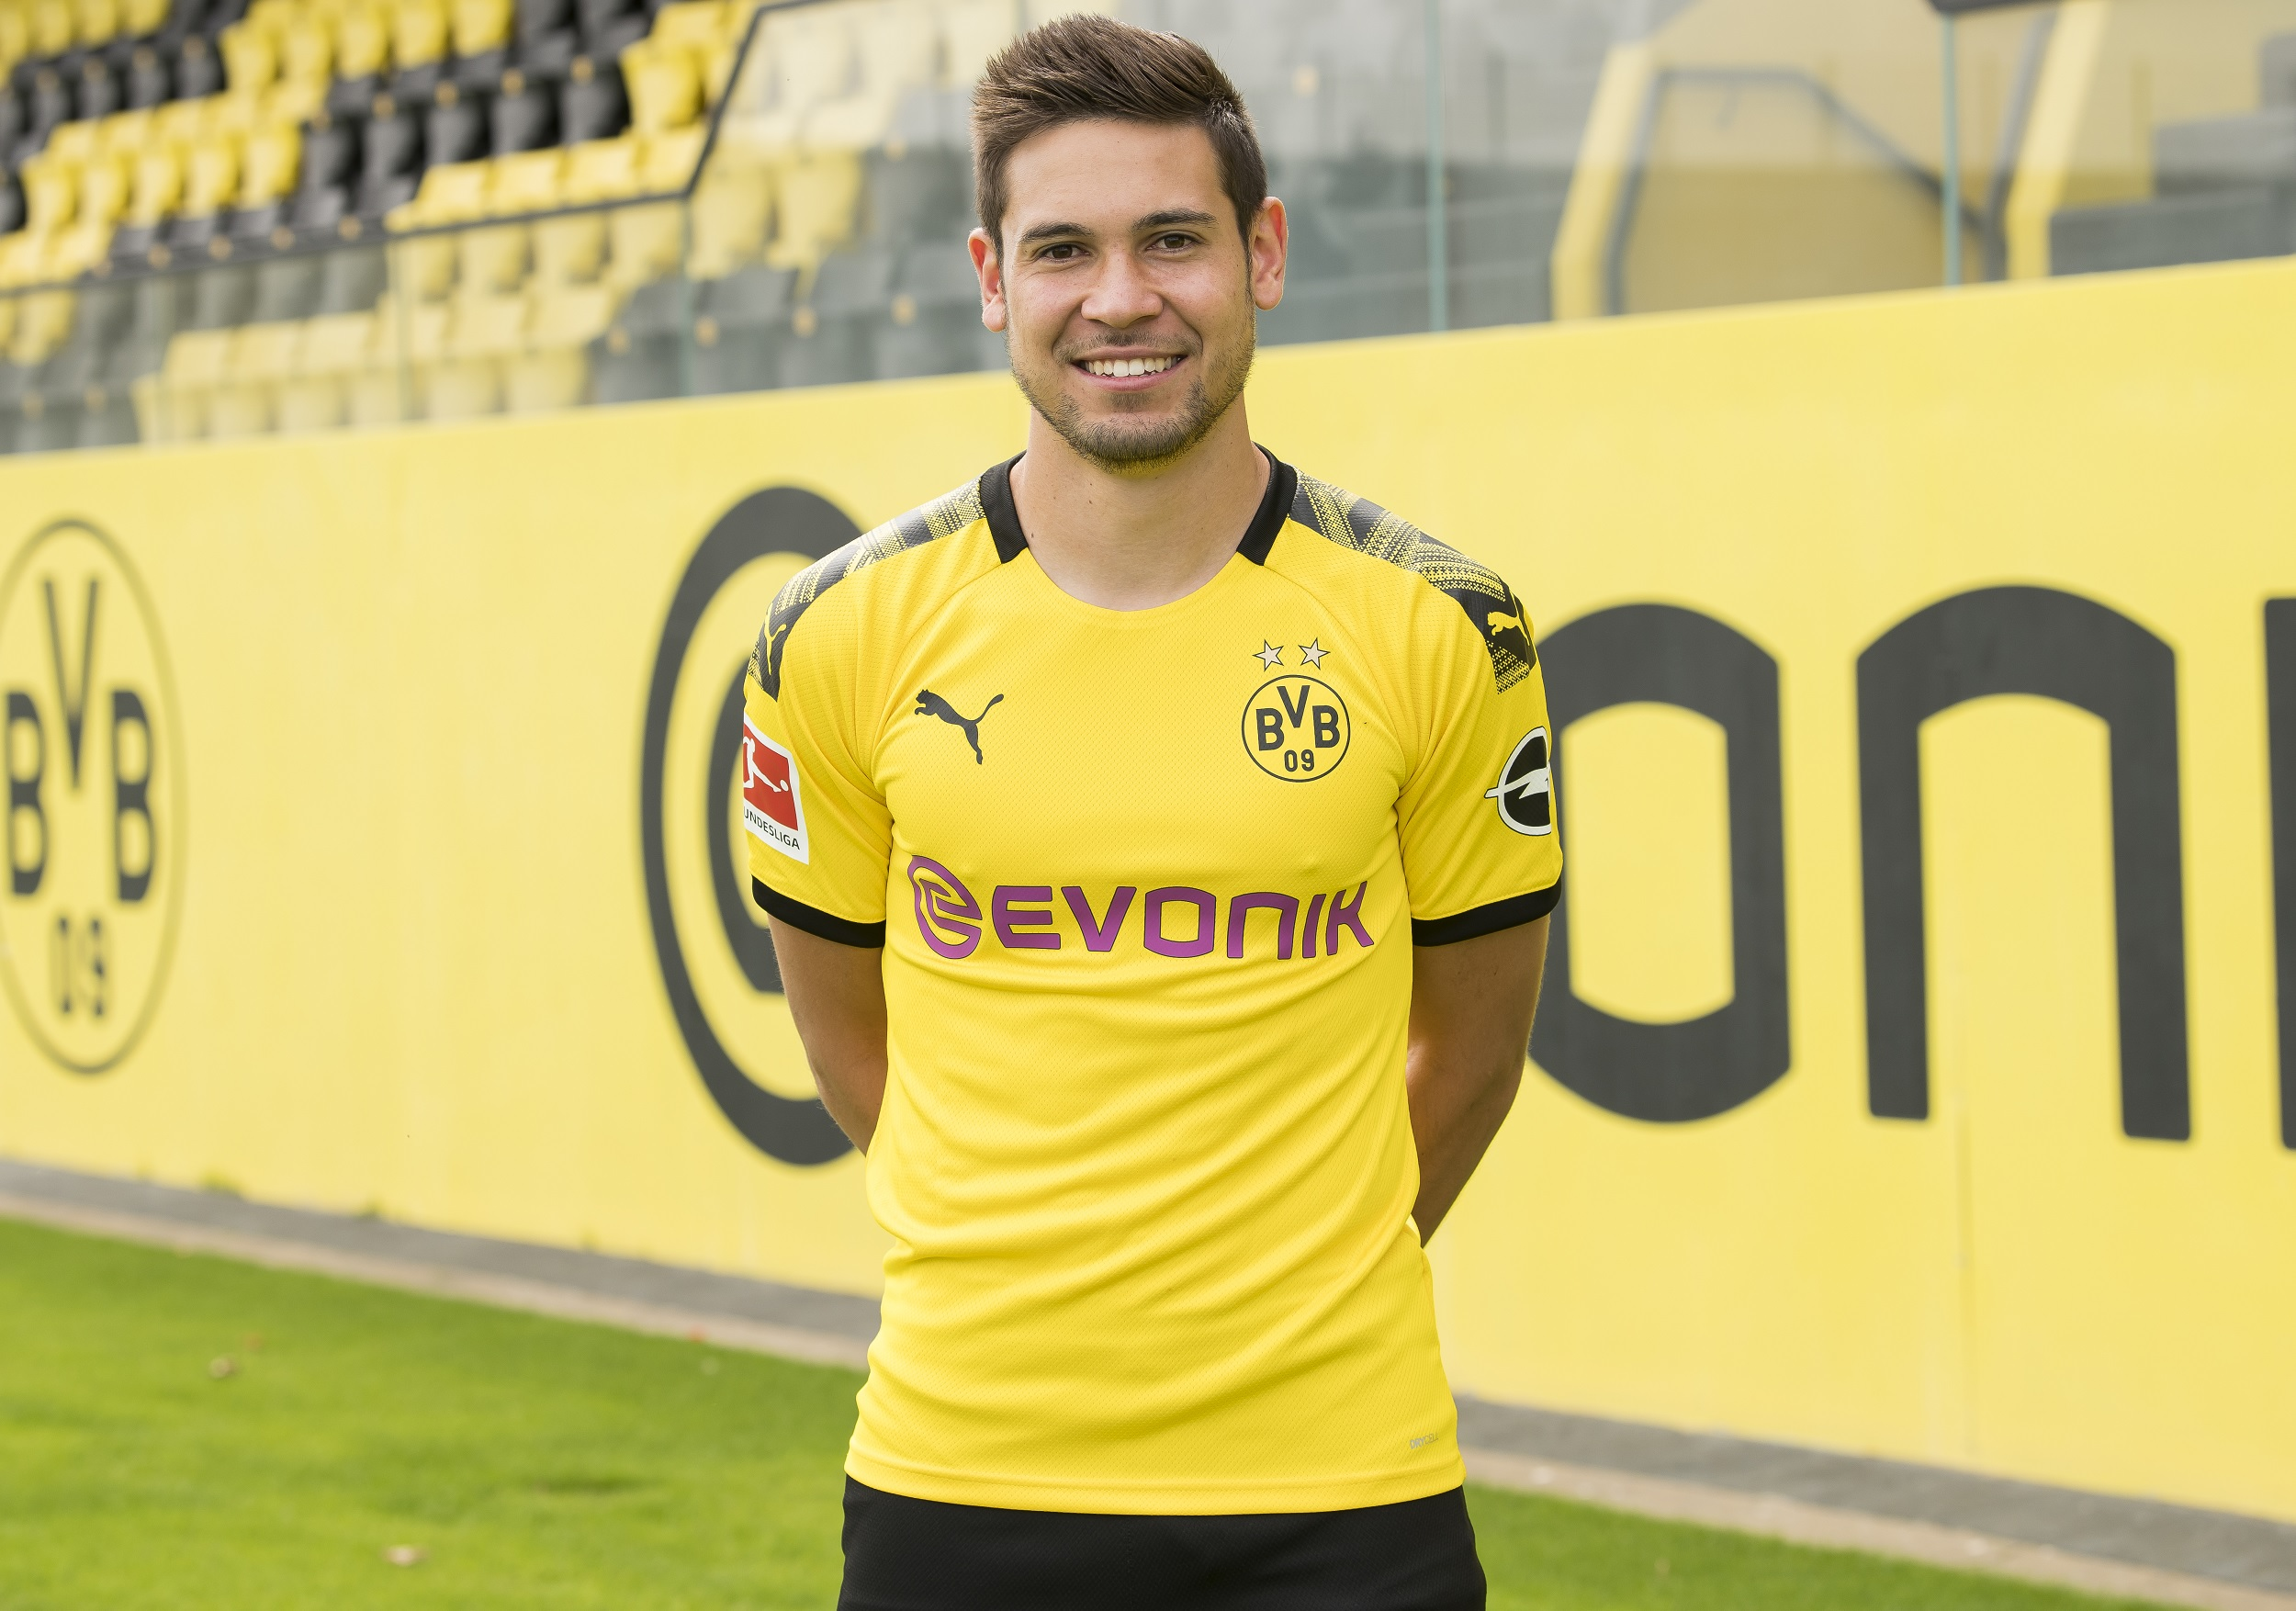 BVB boss reveals that Raphael Guerreiro is set to sign a new deal